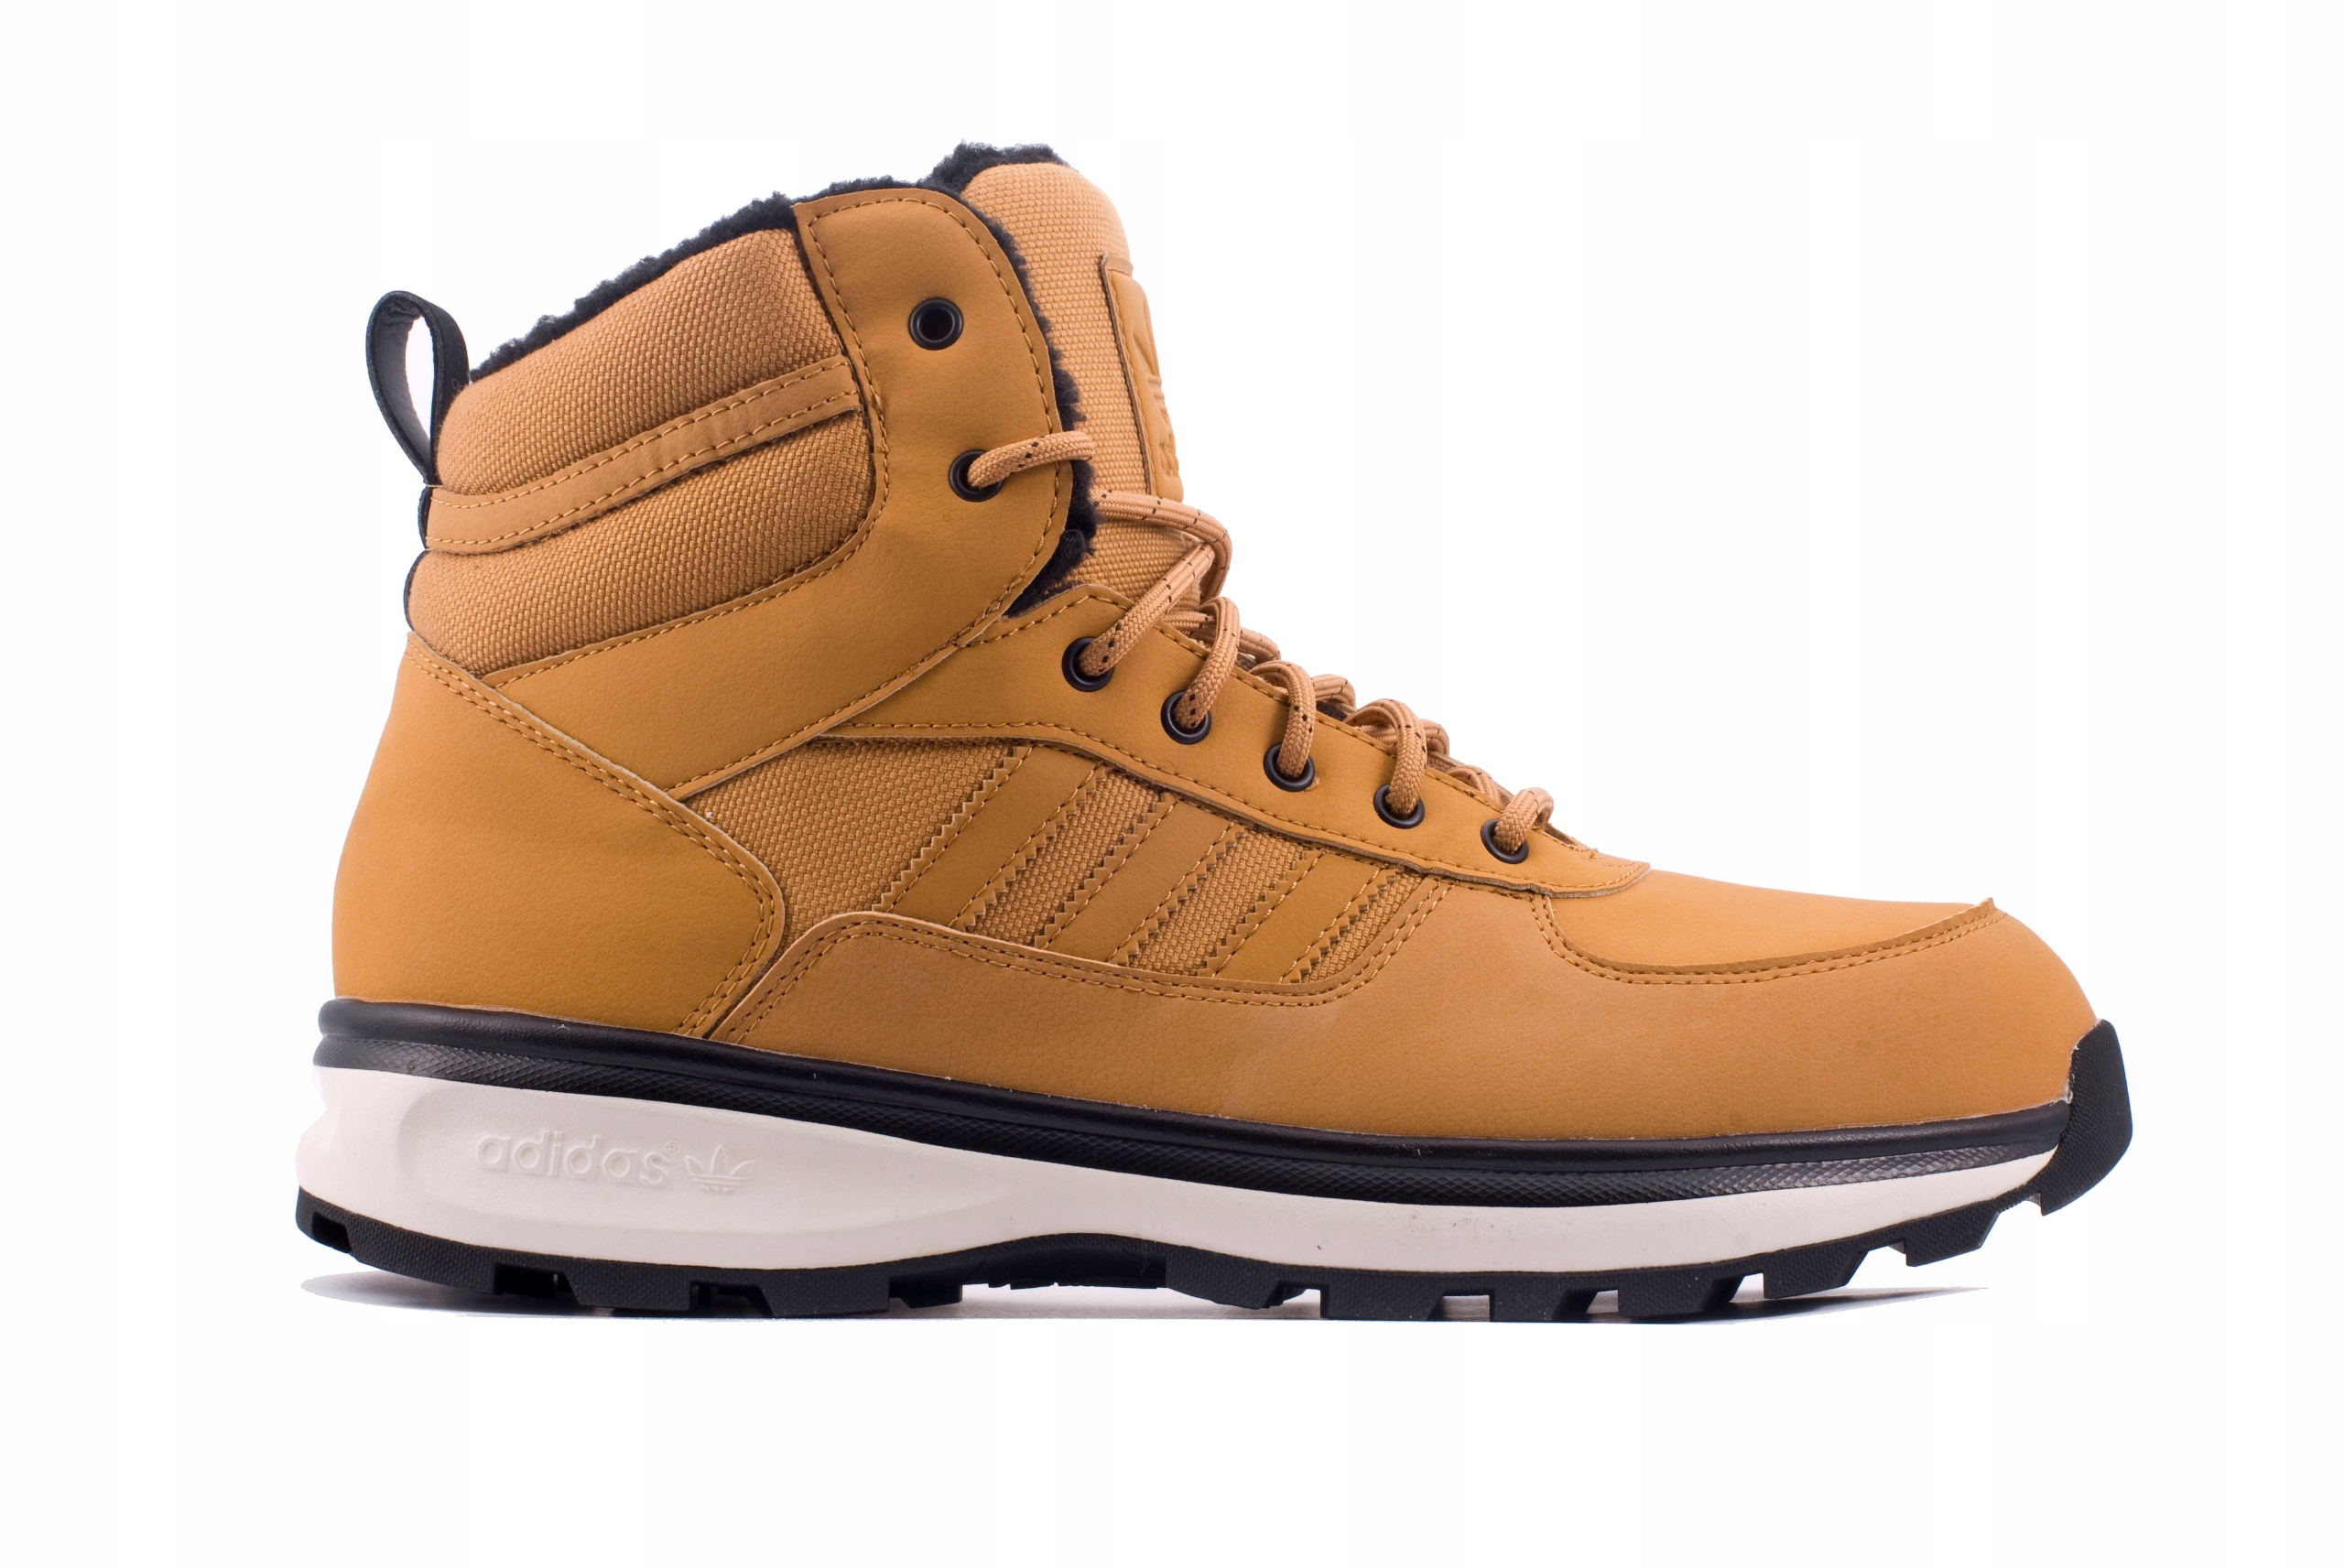 Condicional pérdida blusa  ADIDAS Chasker Boot M20693 ZIMA r.46 8537757109 - Allegro.pl